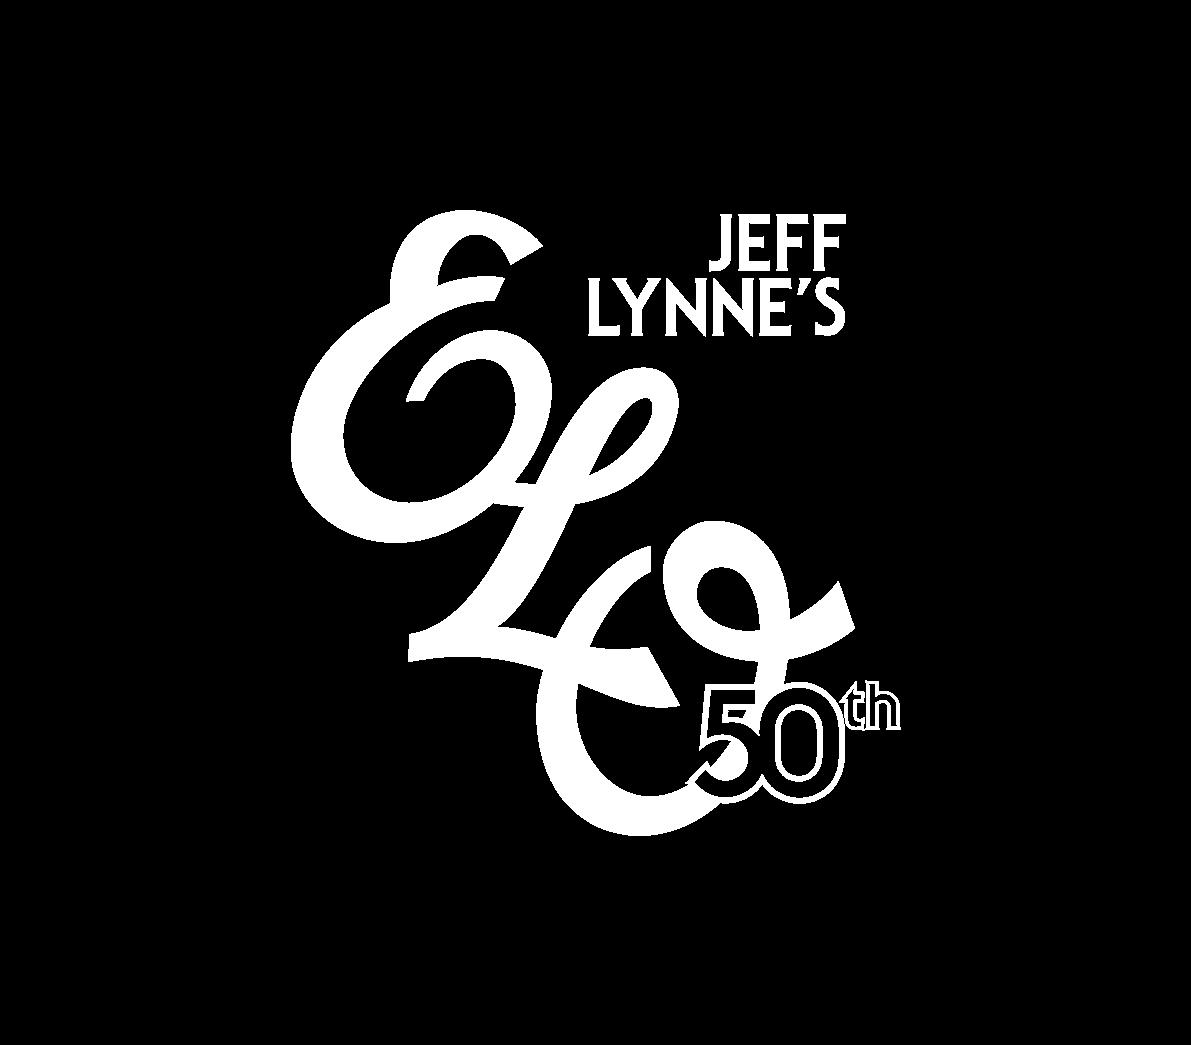 ELO 50th Anniversary